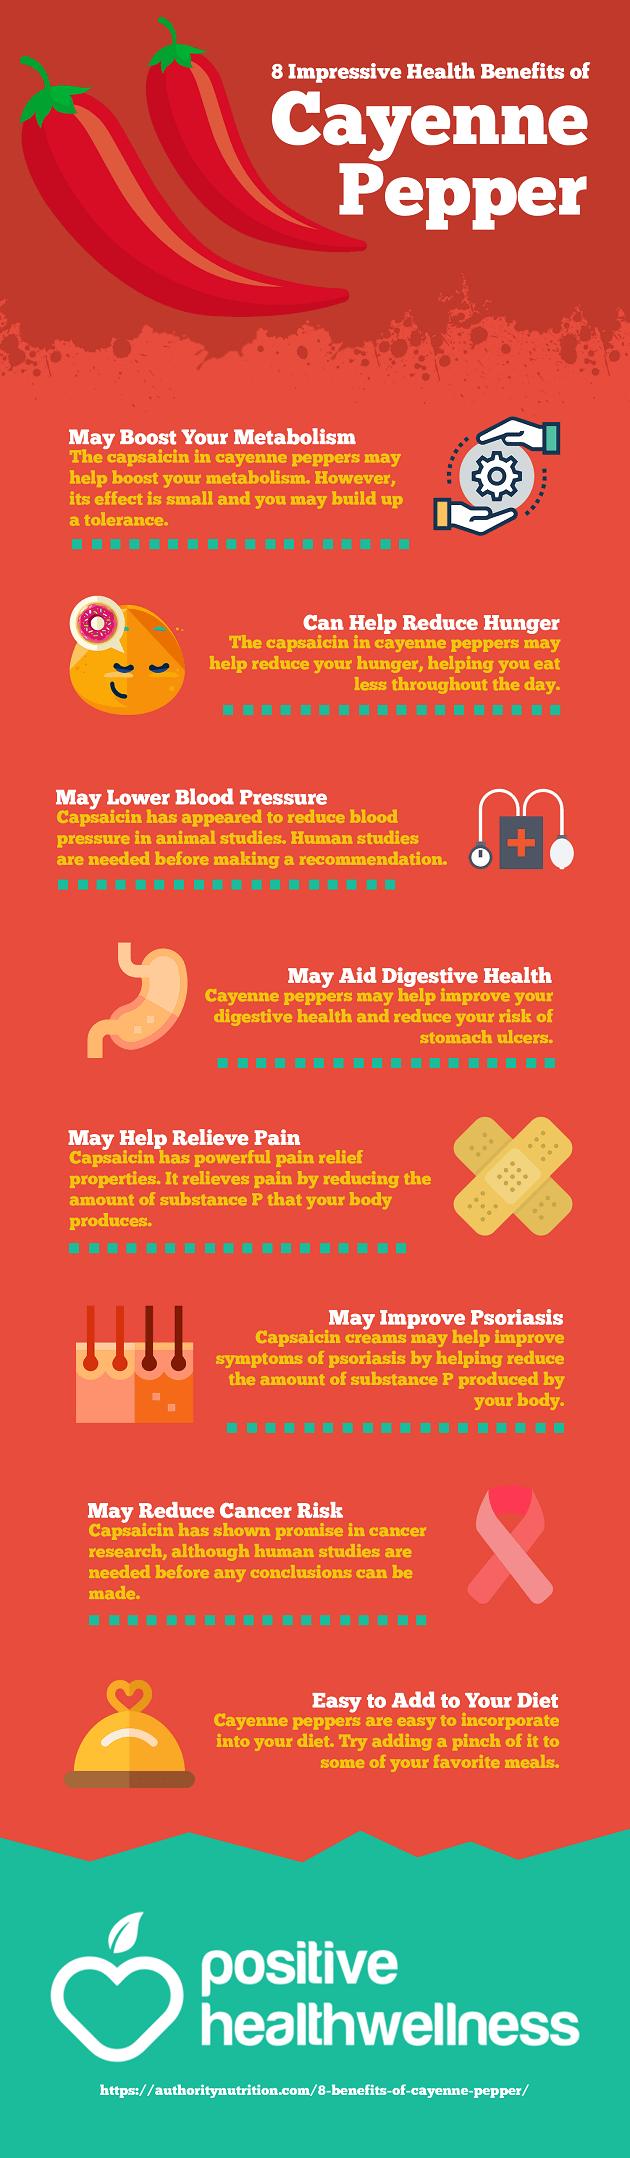 8 Impressive Health Benefits of Cayenne Pepper